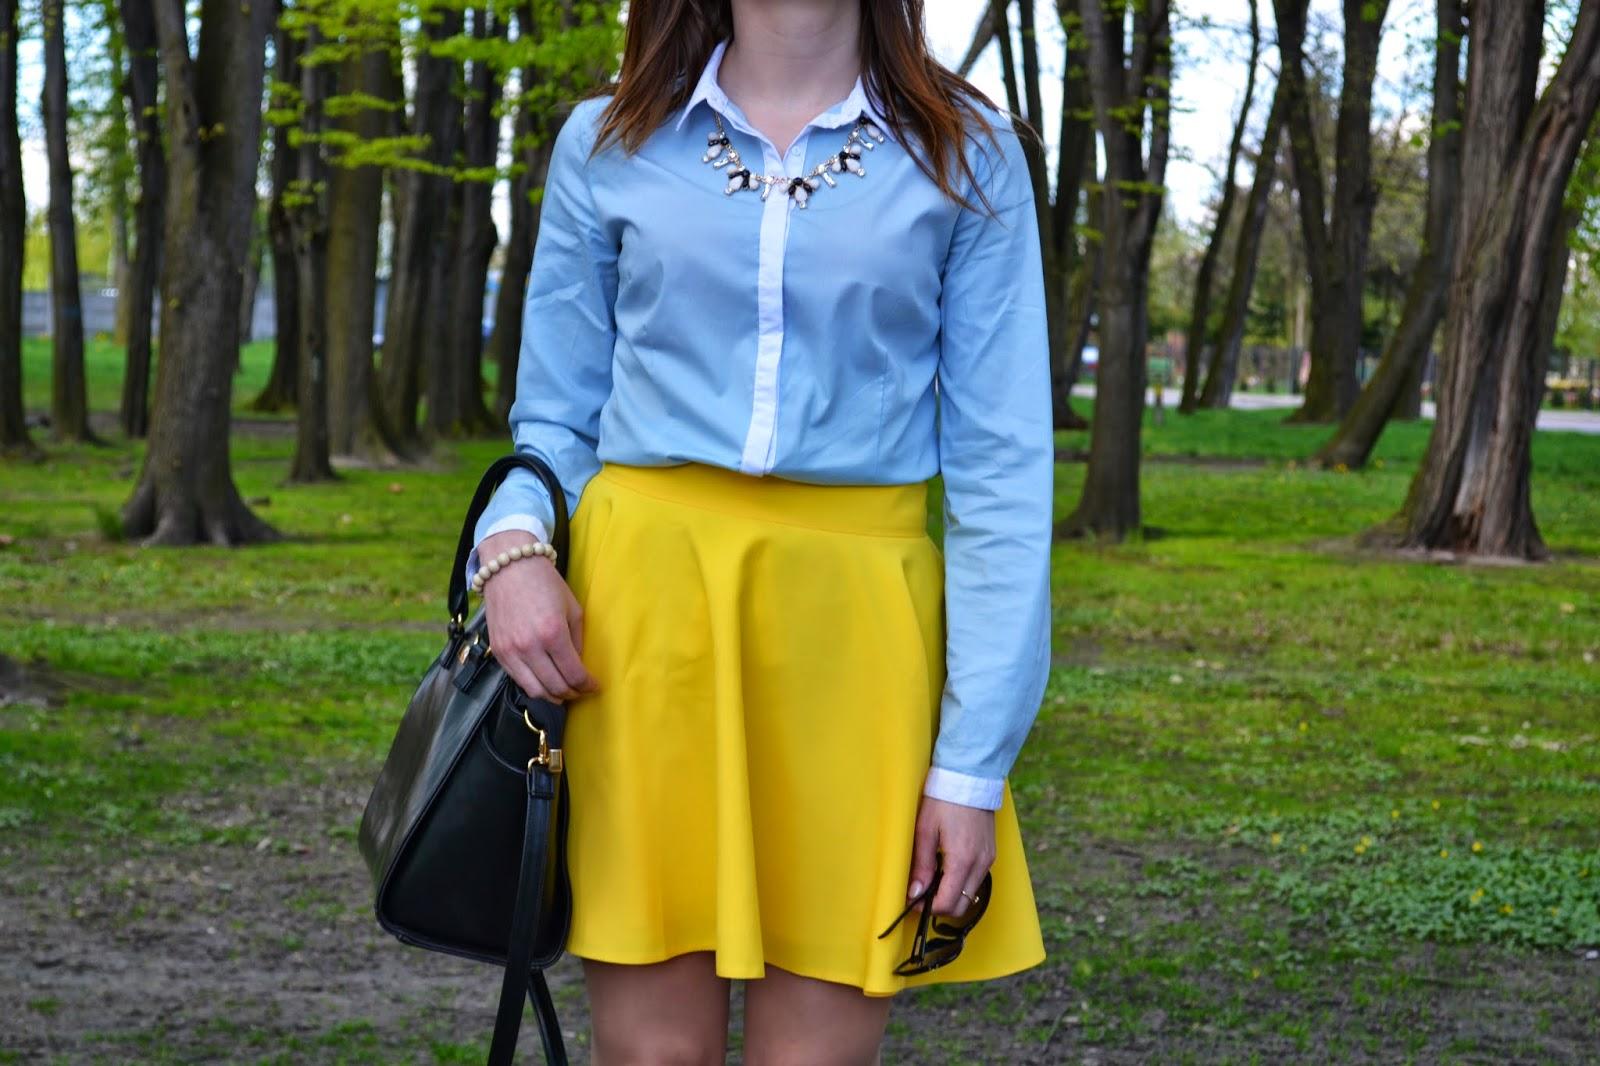 żółta spódnica, rozkloszowana spódnica